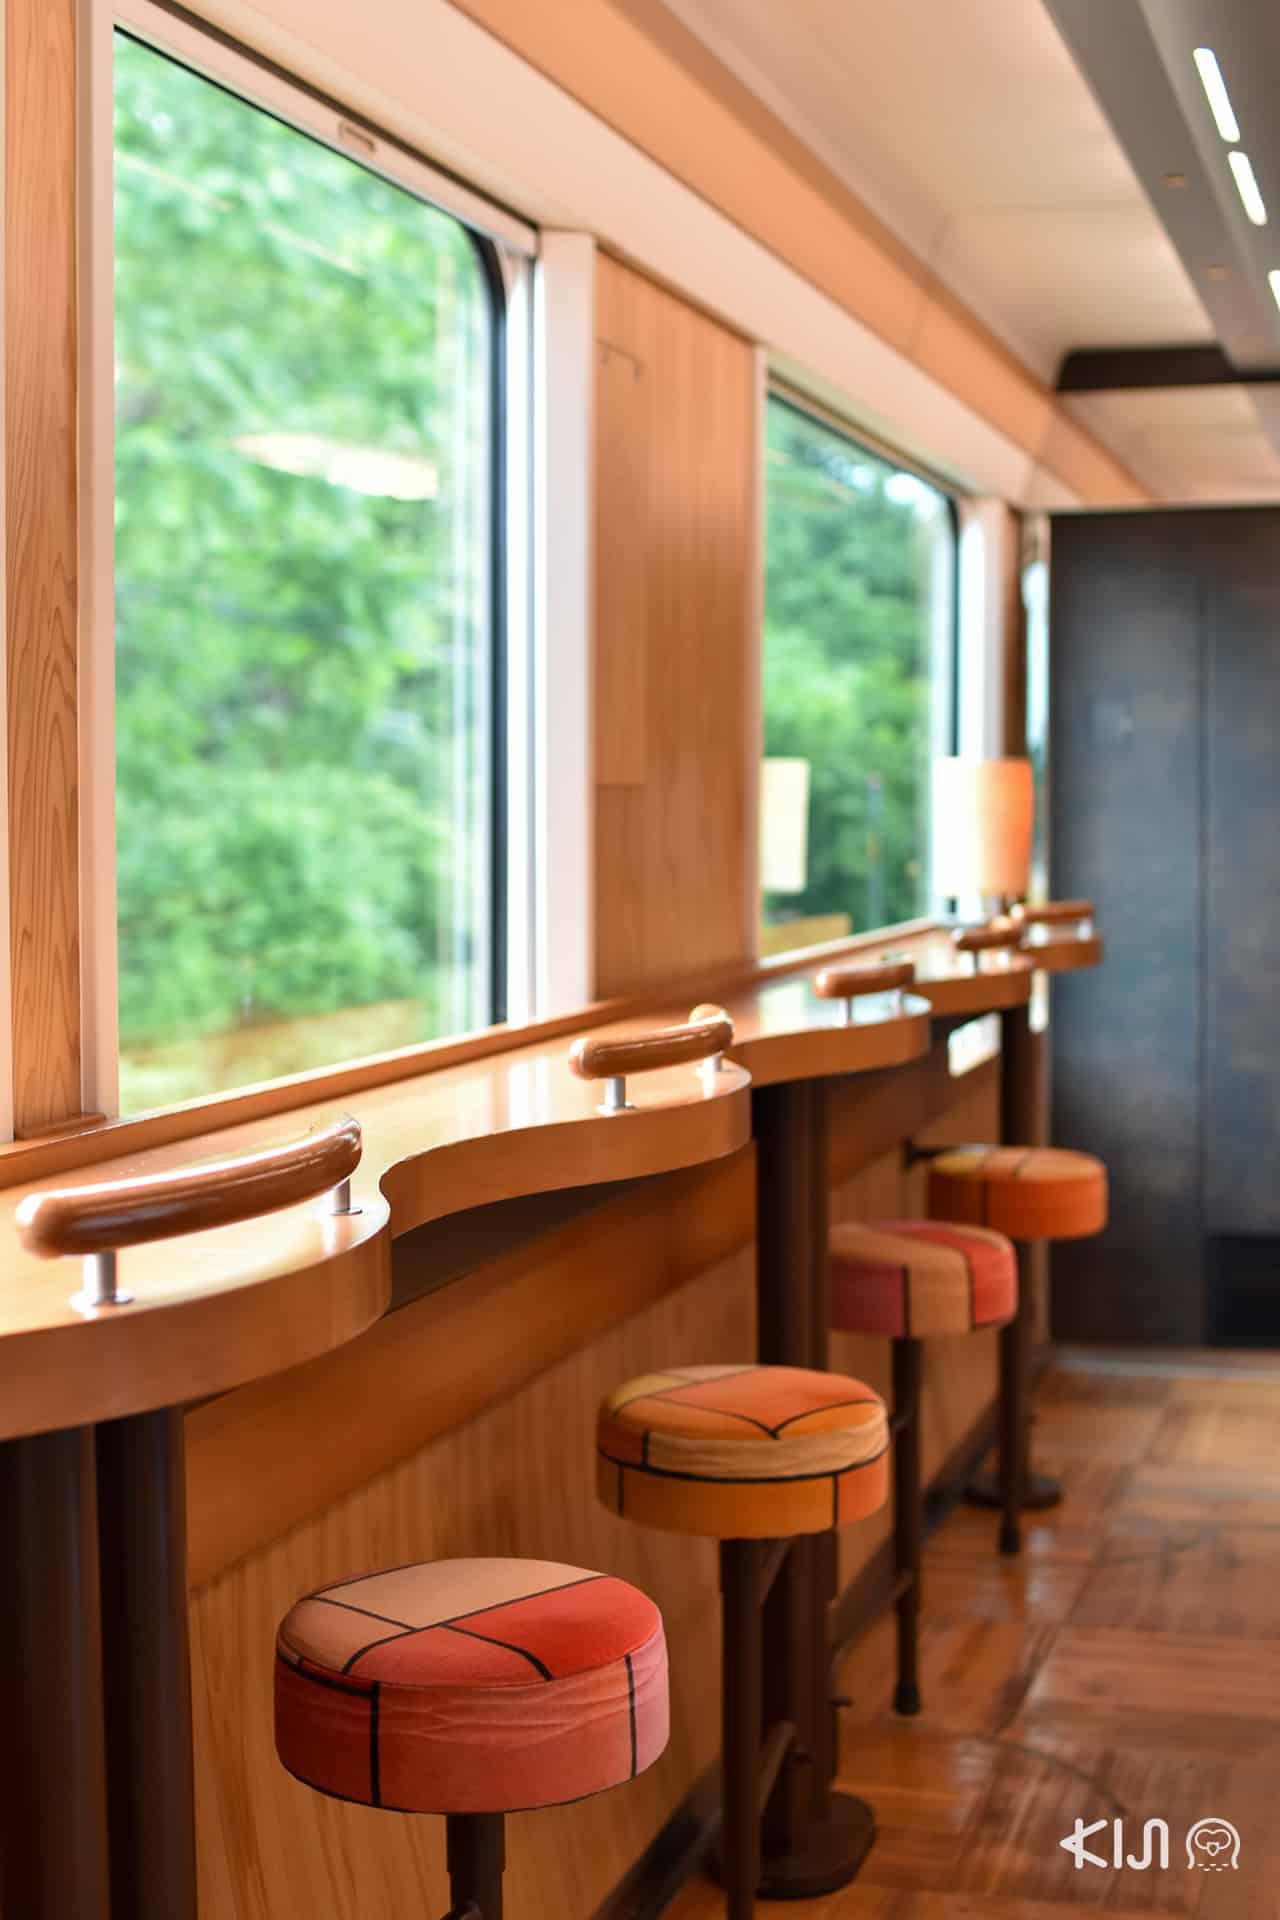 JR East Pass Tohoku Area - ที่นั่งชมวิวภายในรถไฟ Joyful Train (Resort Shirakami)